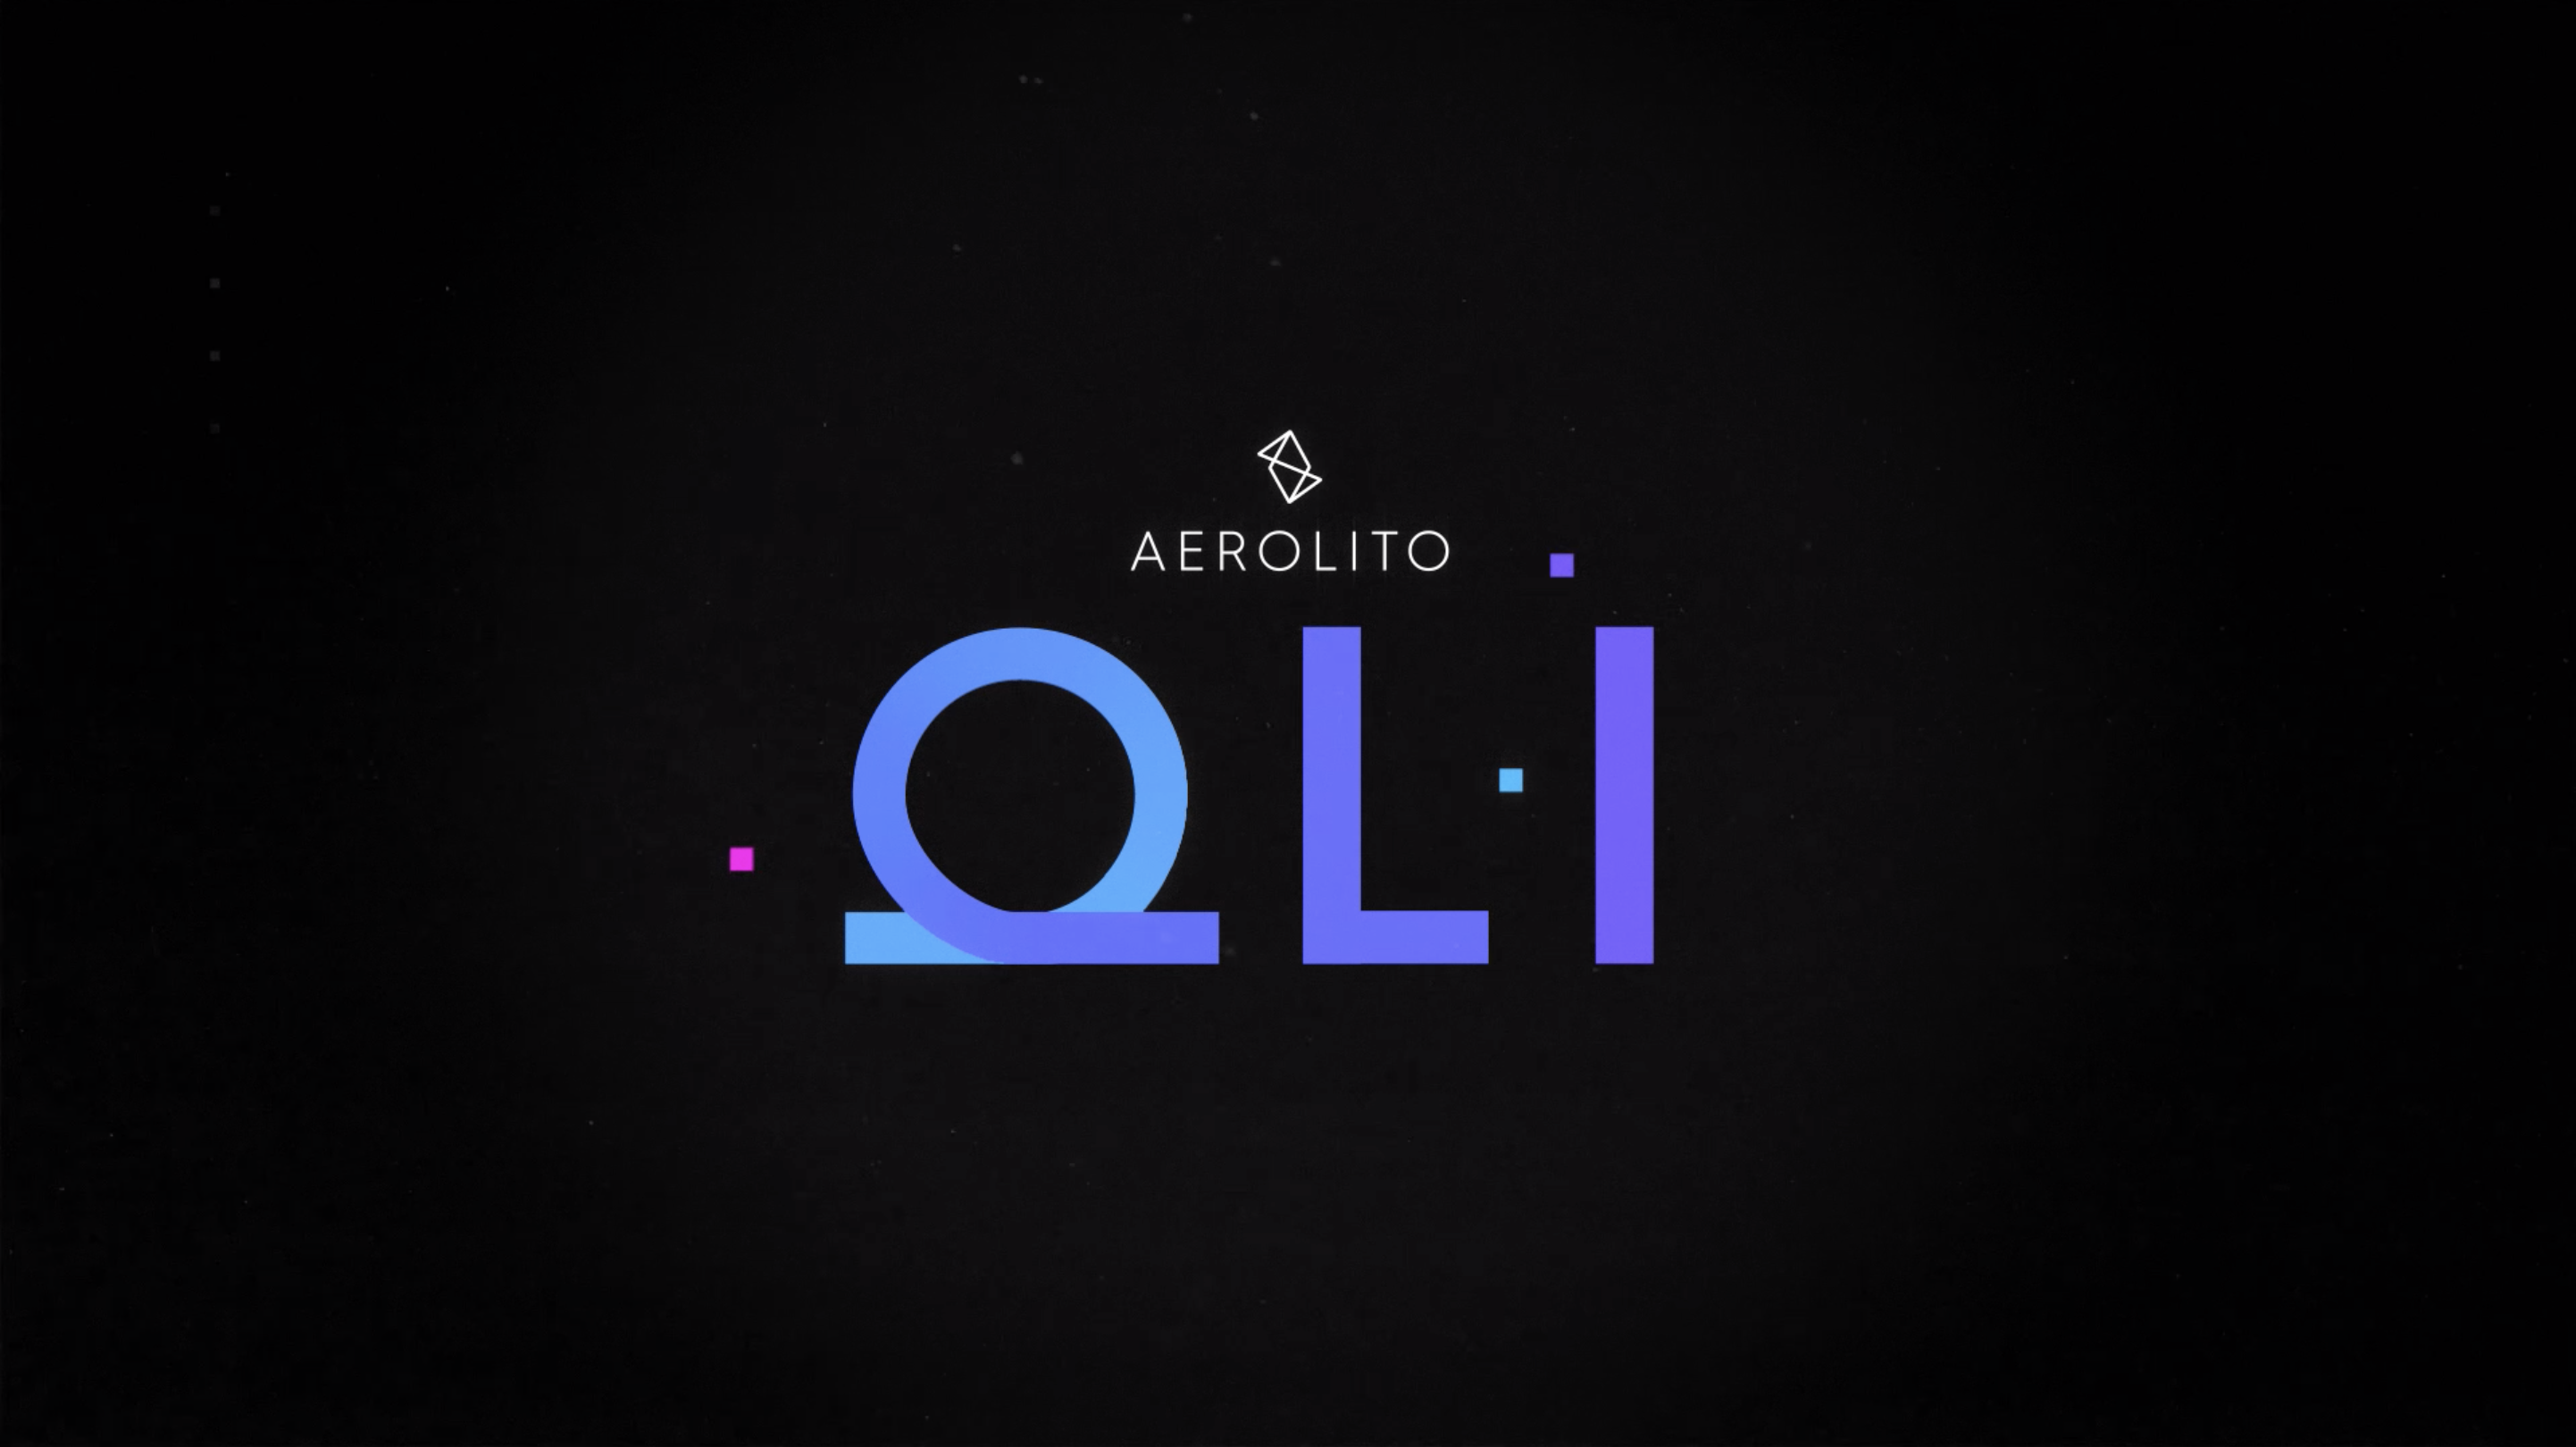 Aerolito - Oli